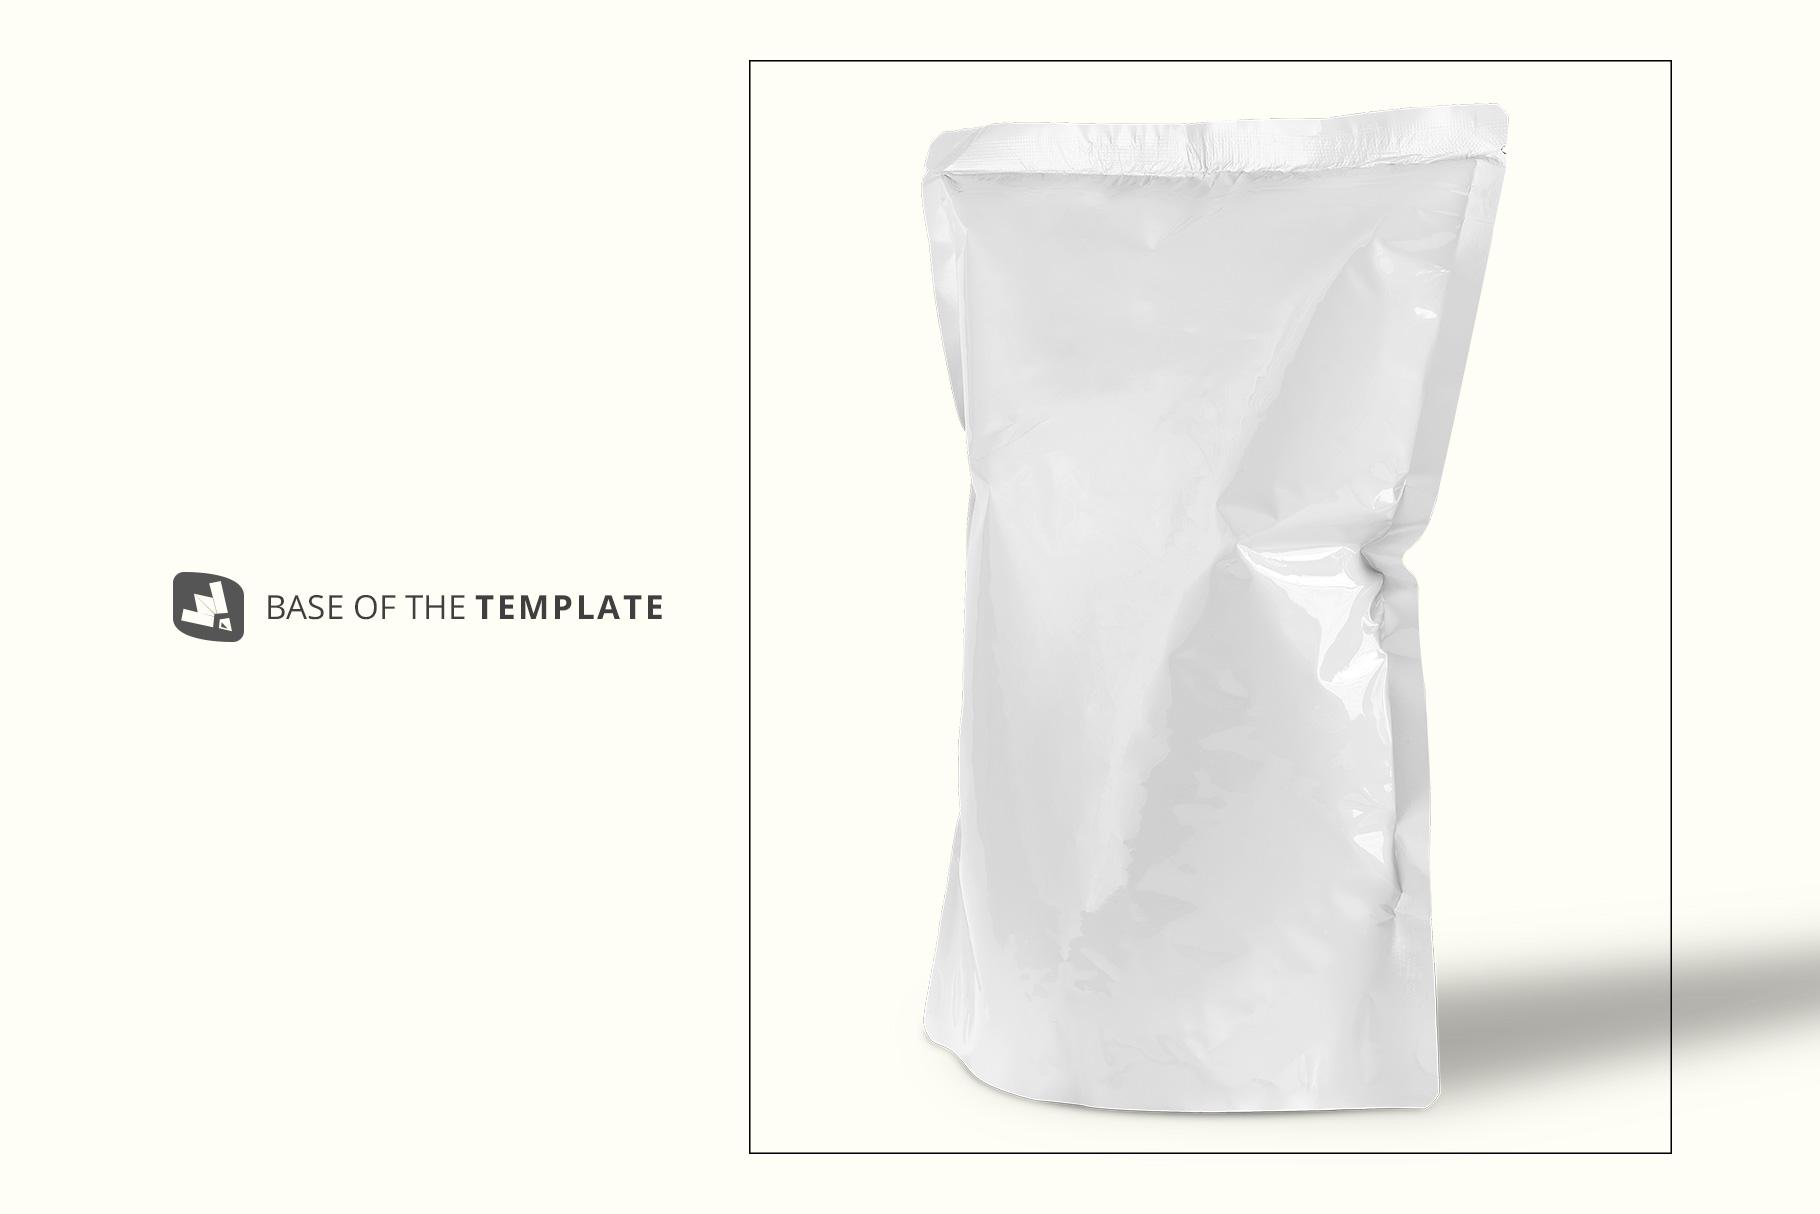 base image of the doypack snacks packaging mockup